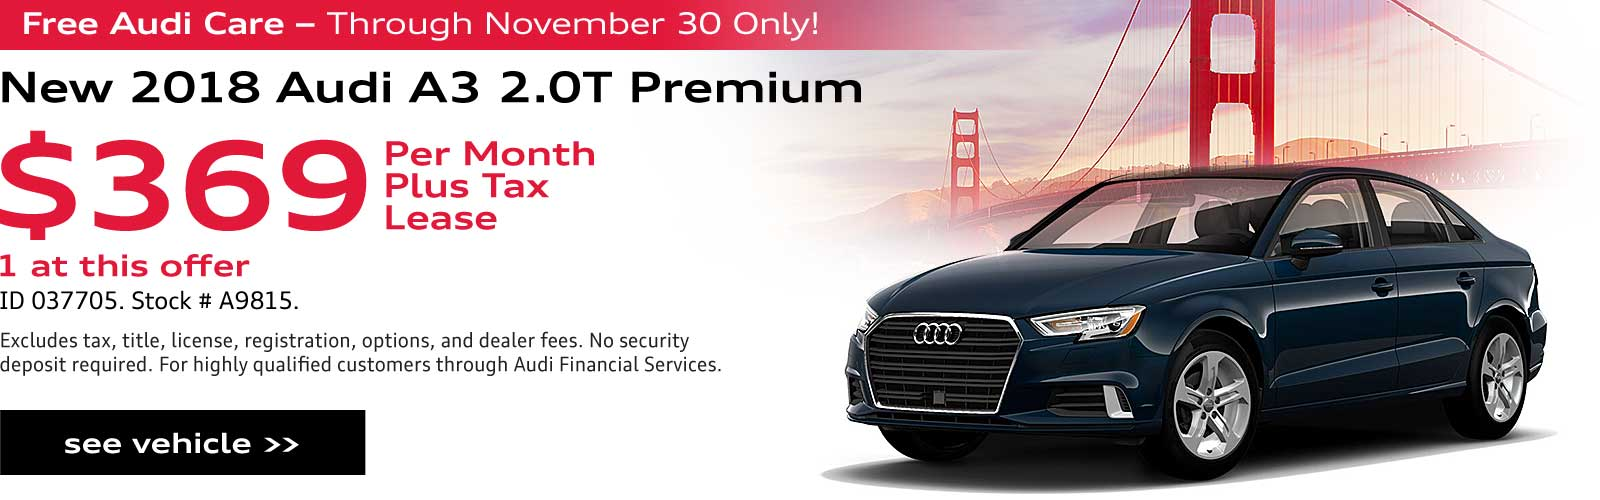 Lease Calculator Audi >> New Audi Specials In San Rafael At Audi Marin Serving San